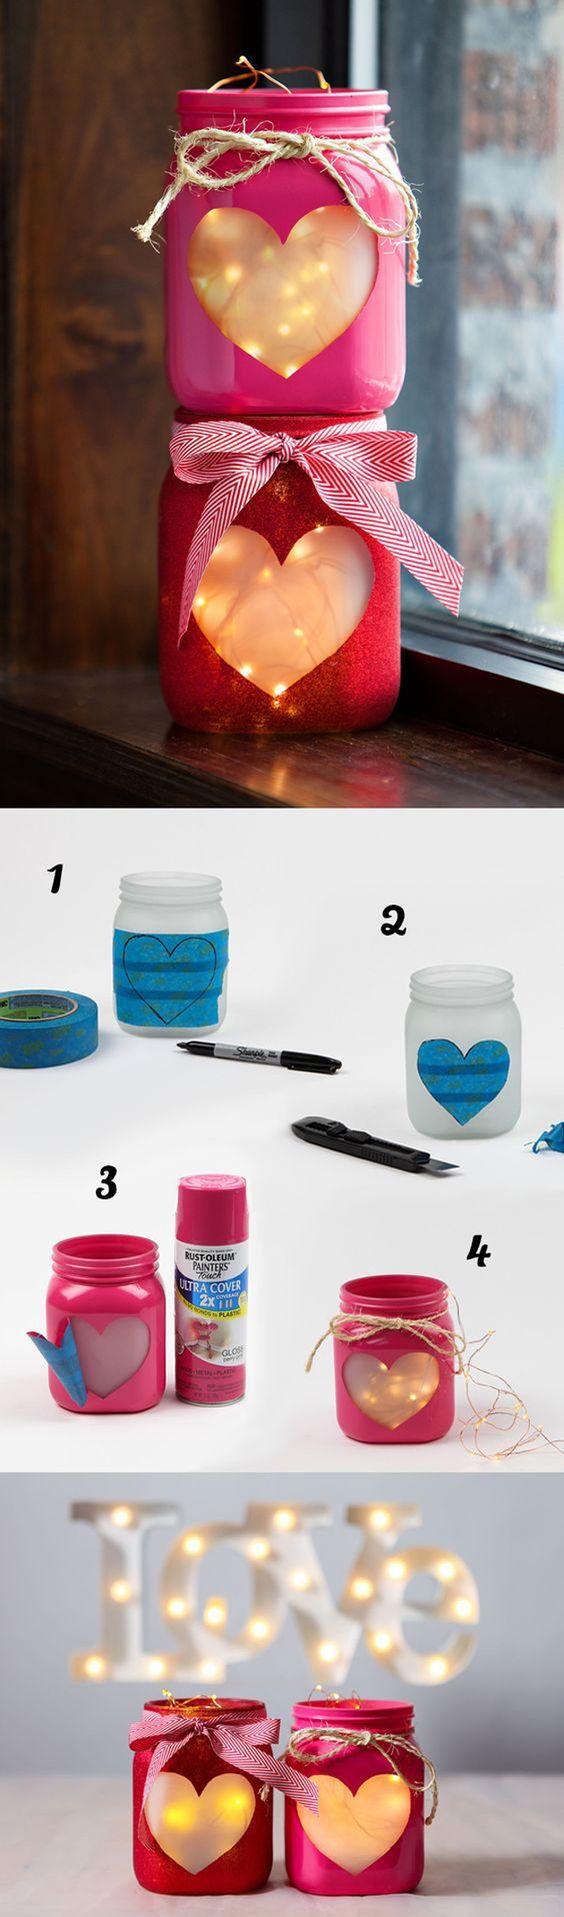 decorating ideas valentine day 1